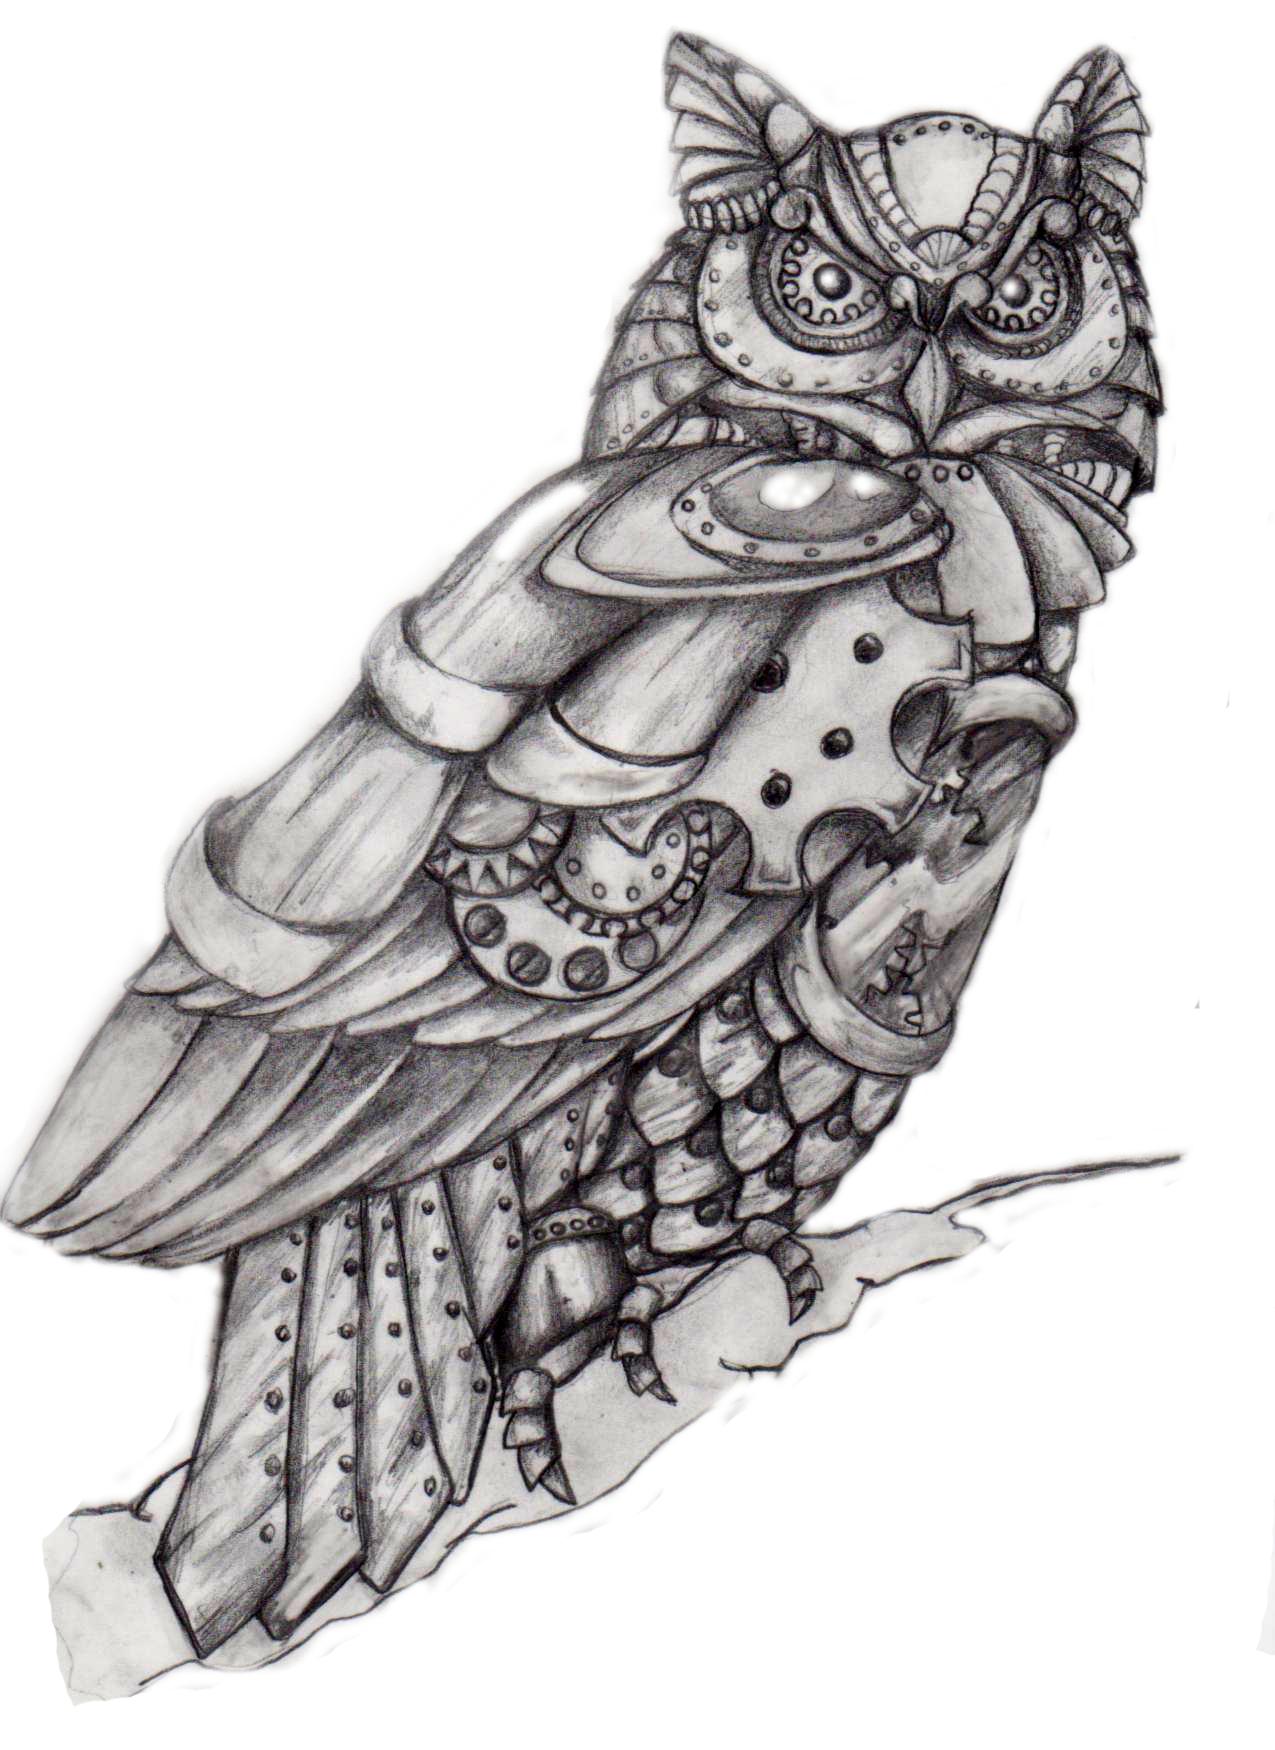 Andi S Steampunk Owl Blak And Grey Steampunk Owls Steampunk Tattoo Owl Tattoo Design